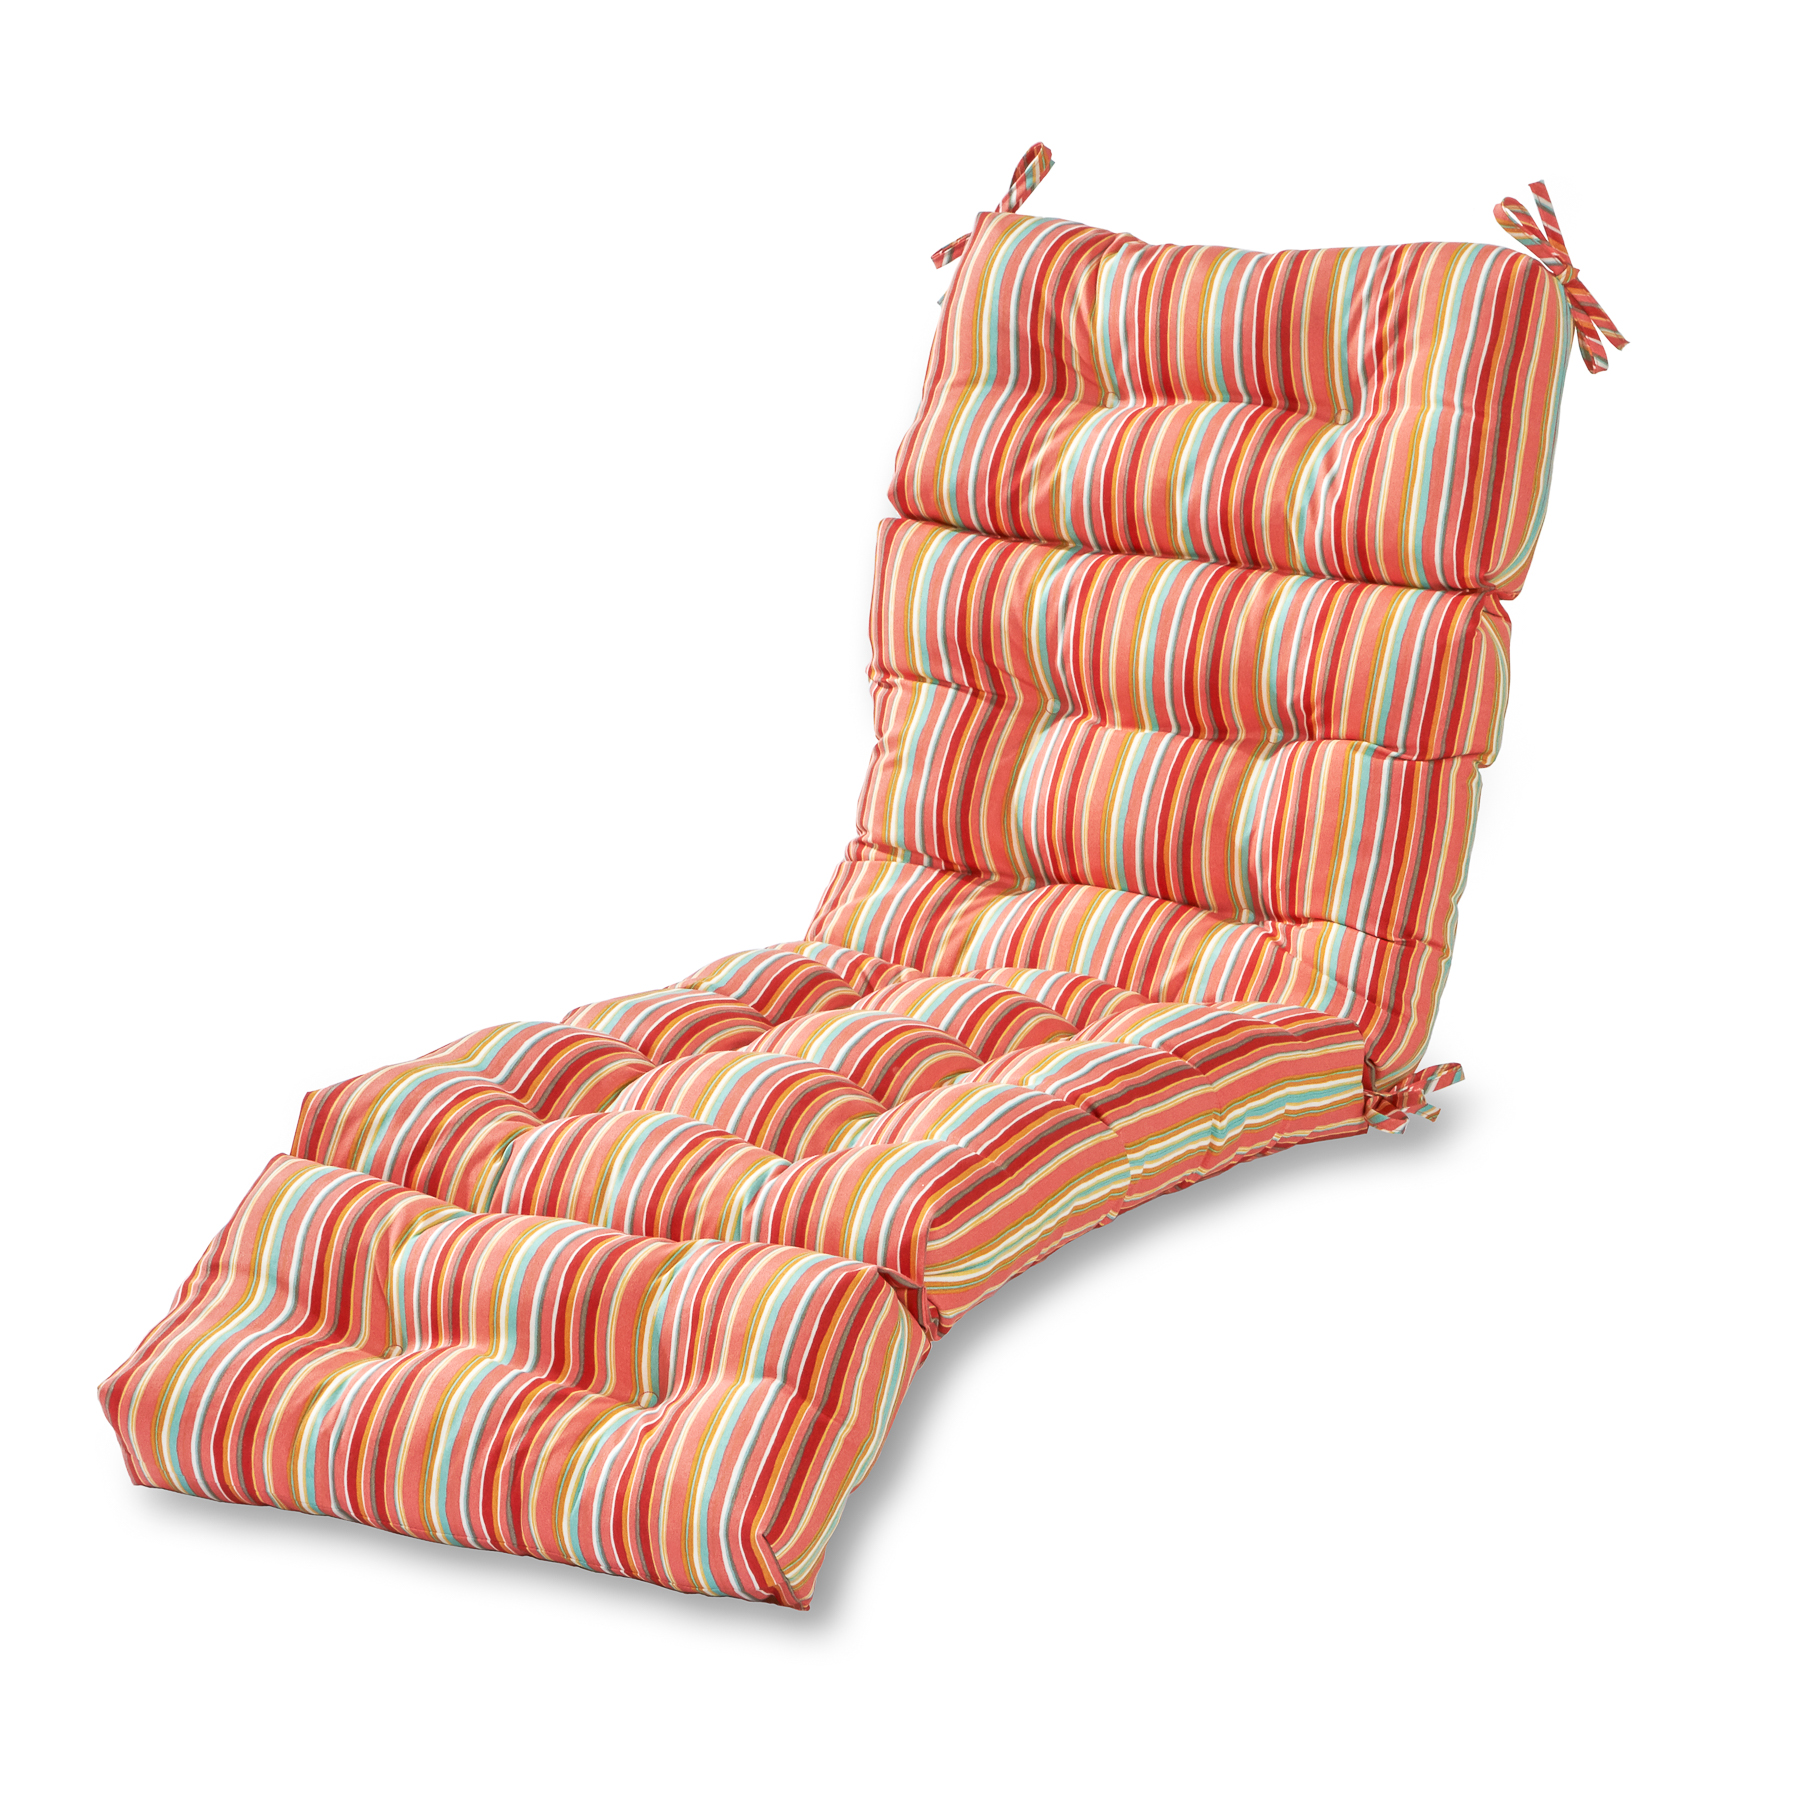 Coastal Stripe 72 x 22 in. Outdoor Chaise Lounge Cushion